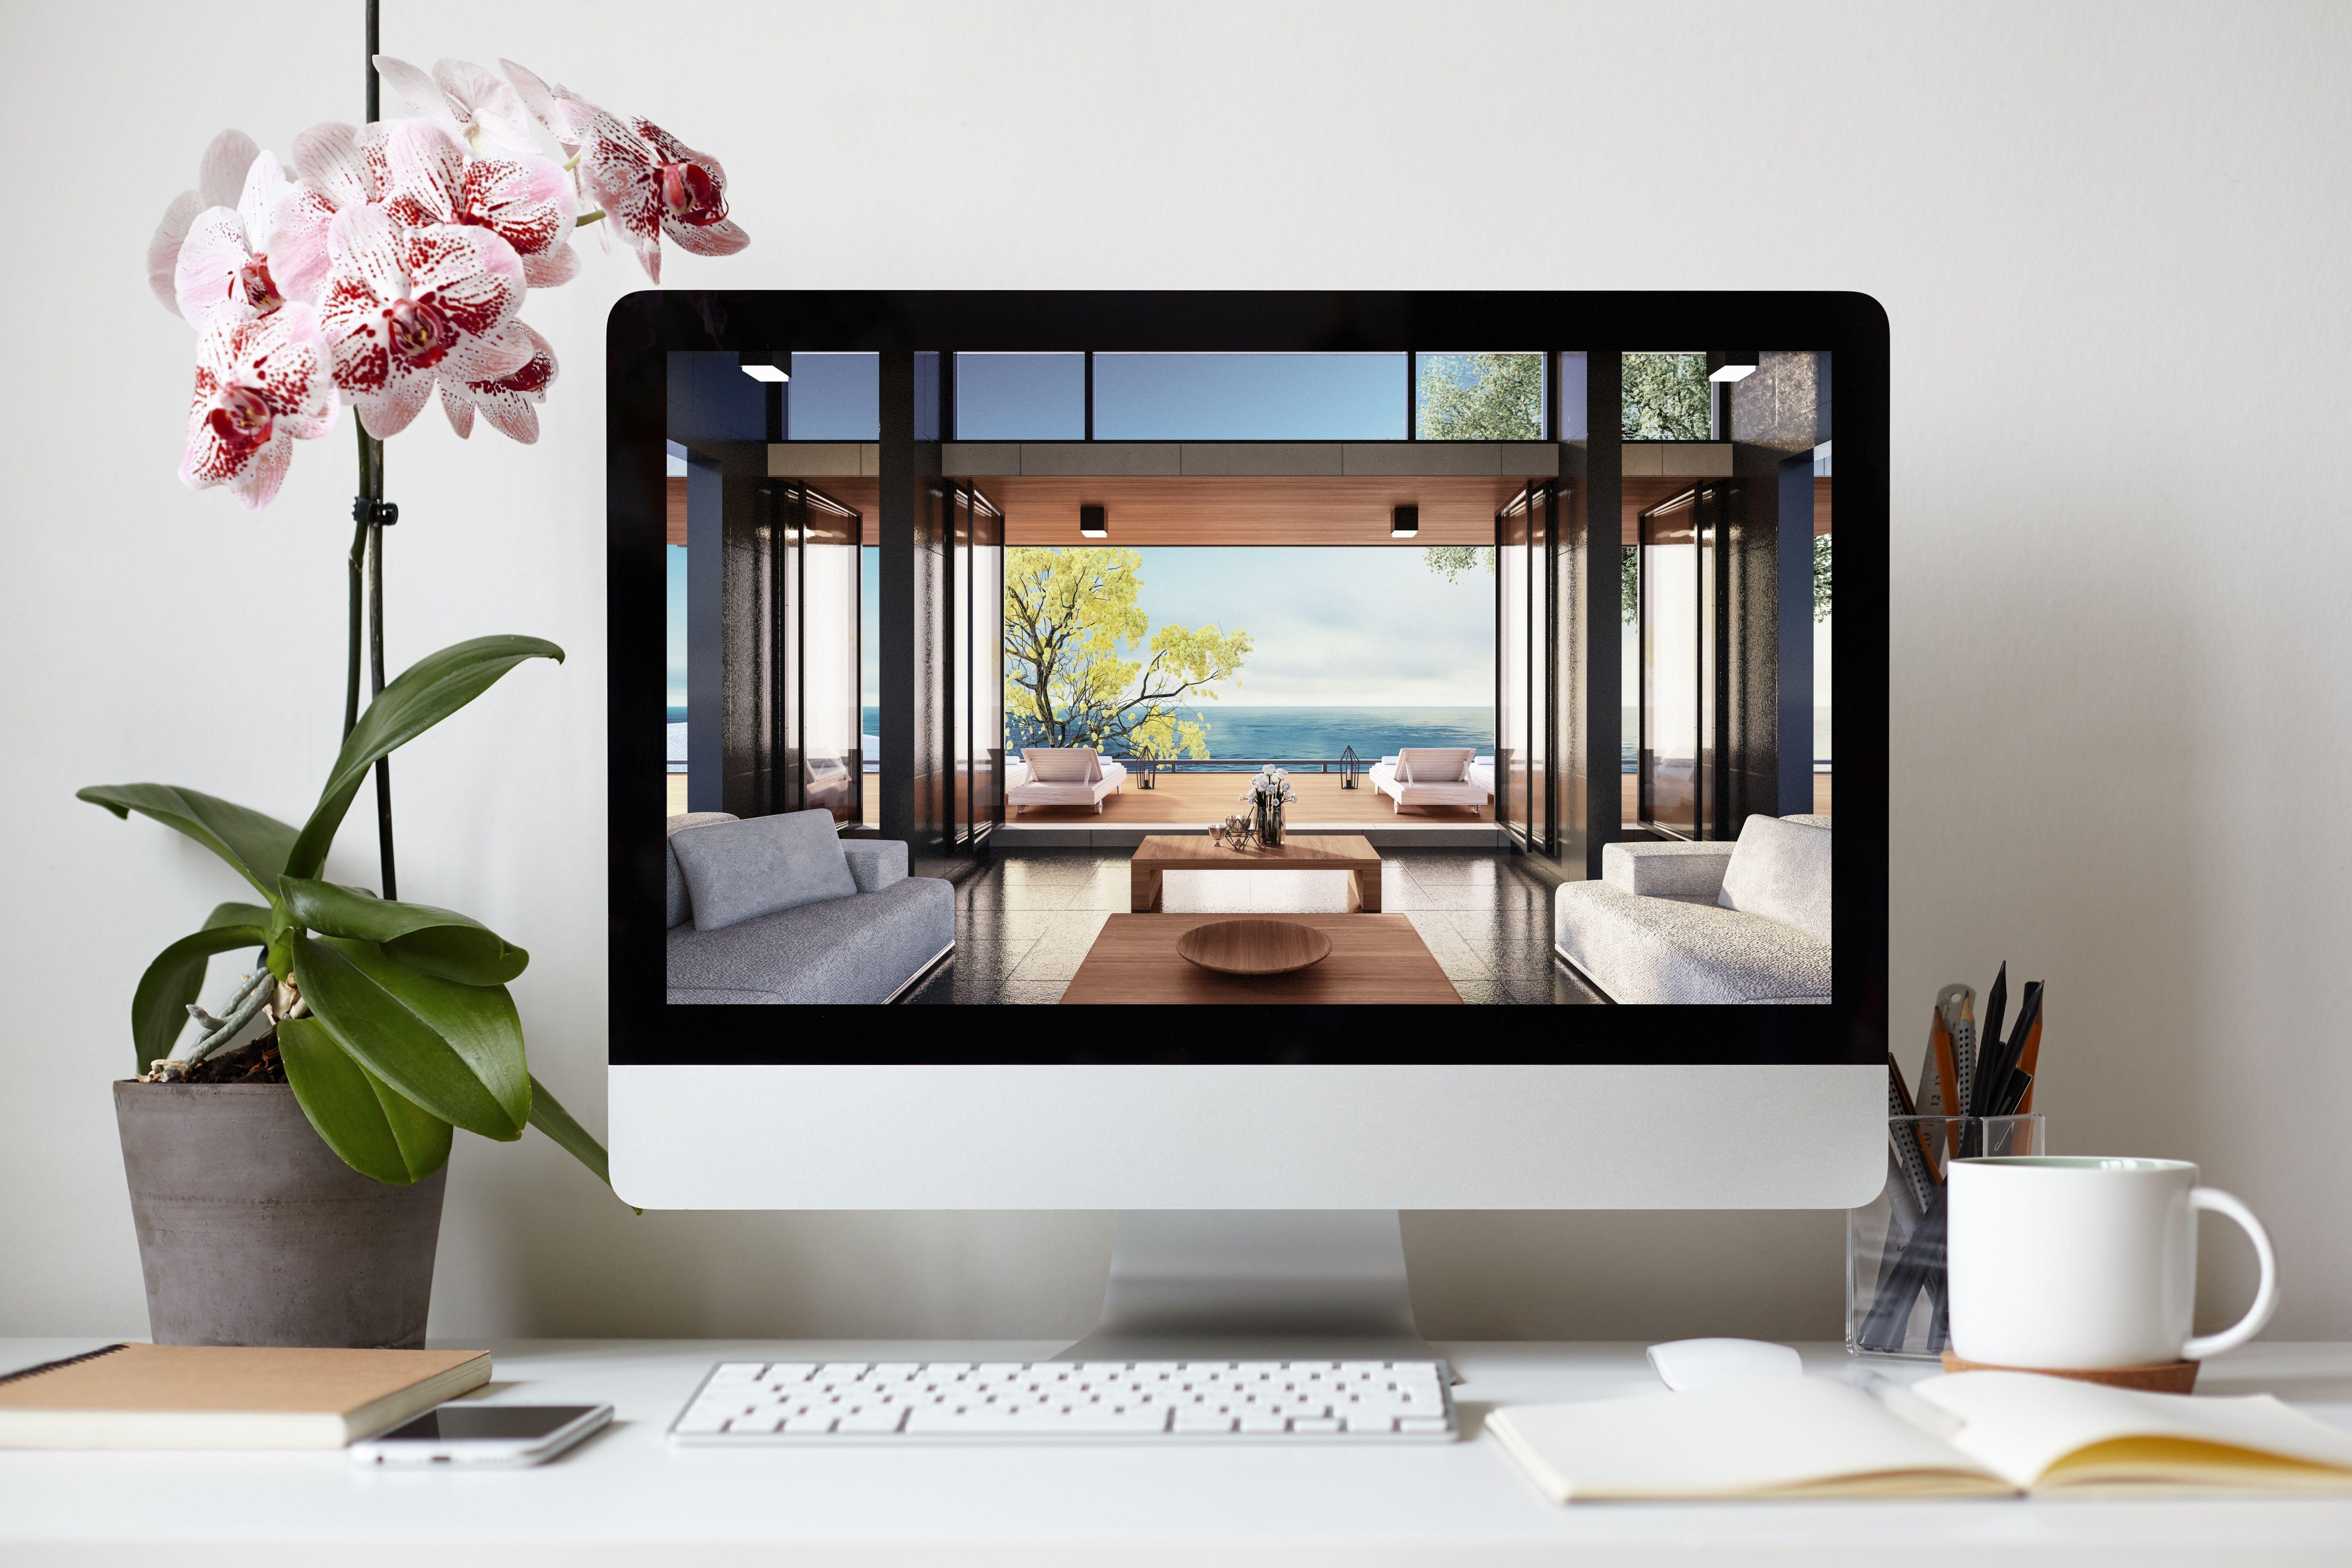 luxury house viewing on modern desktop computer